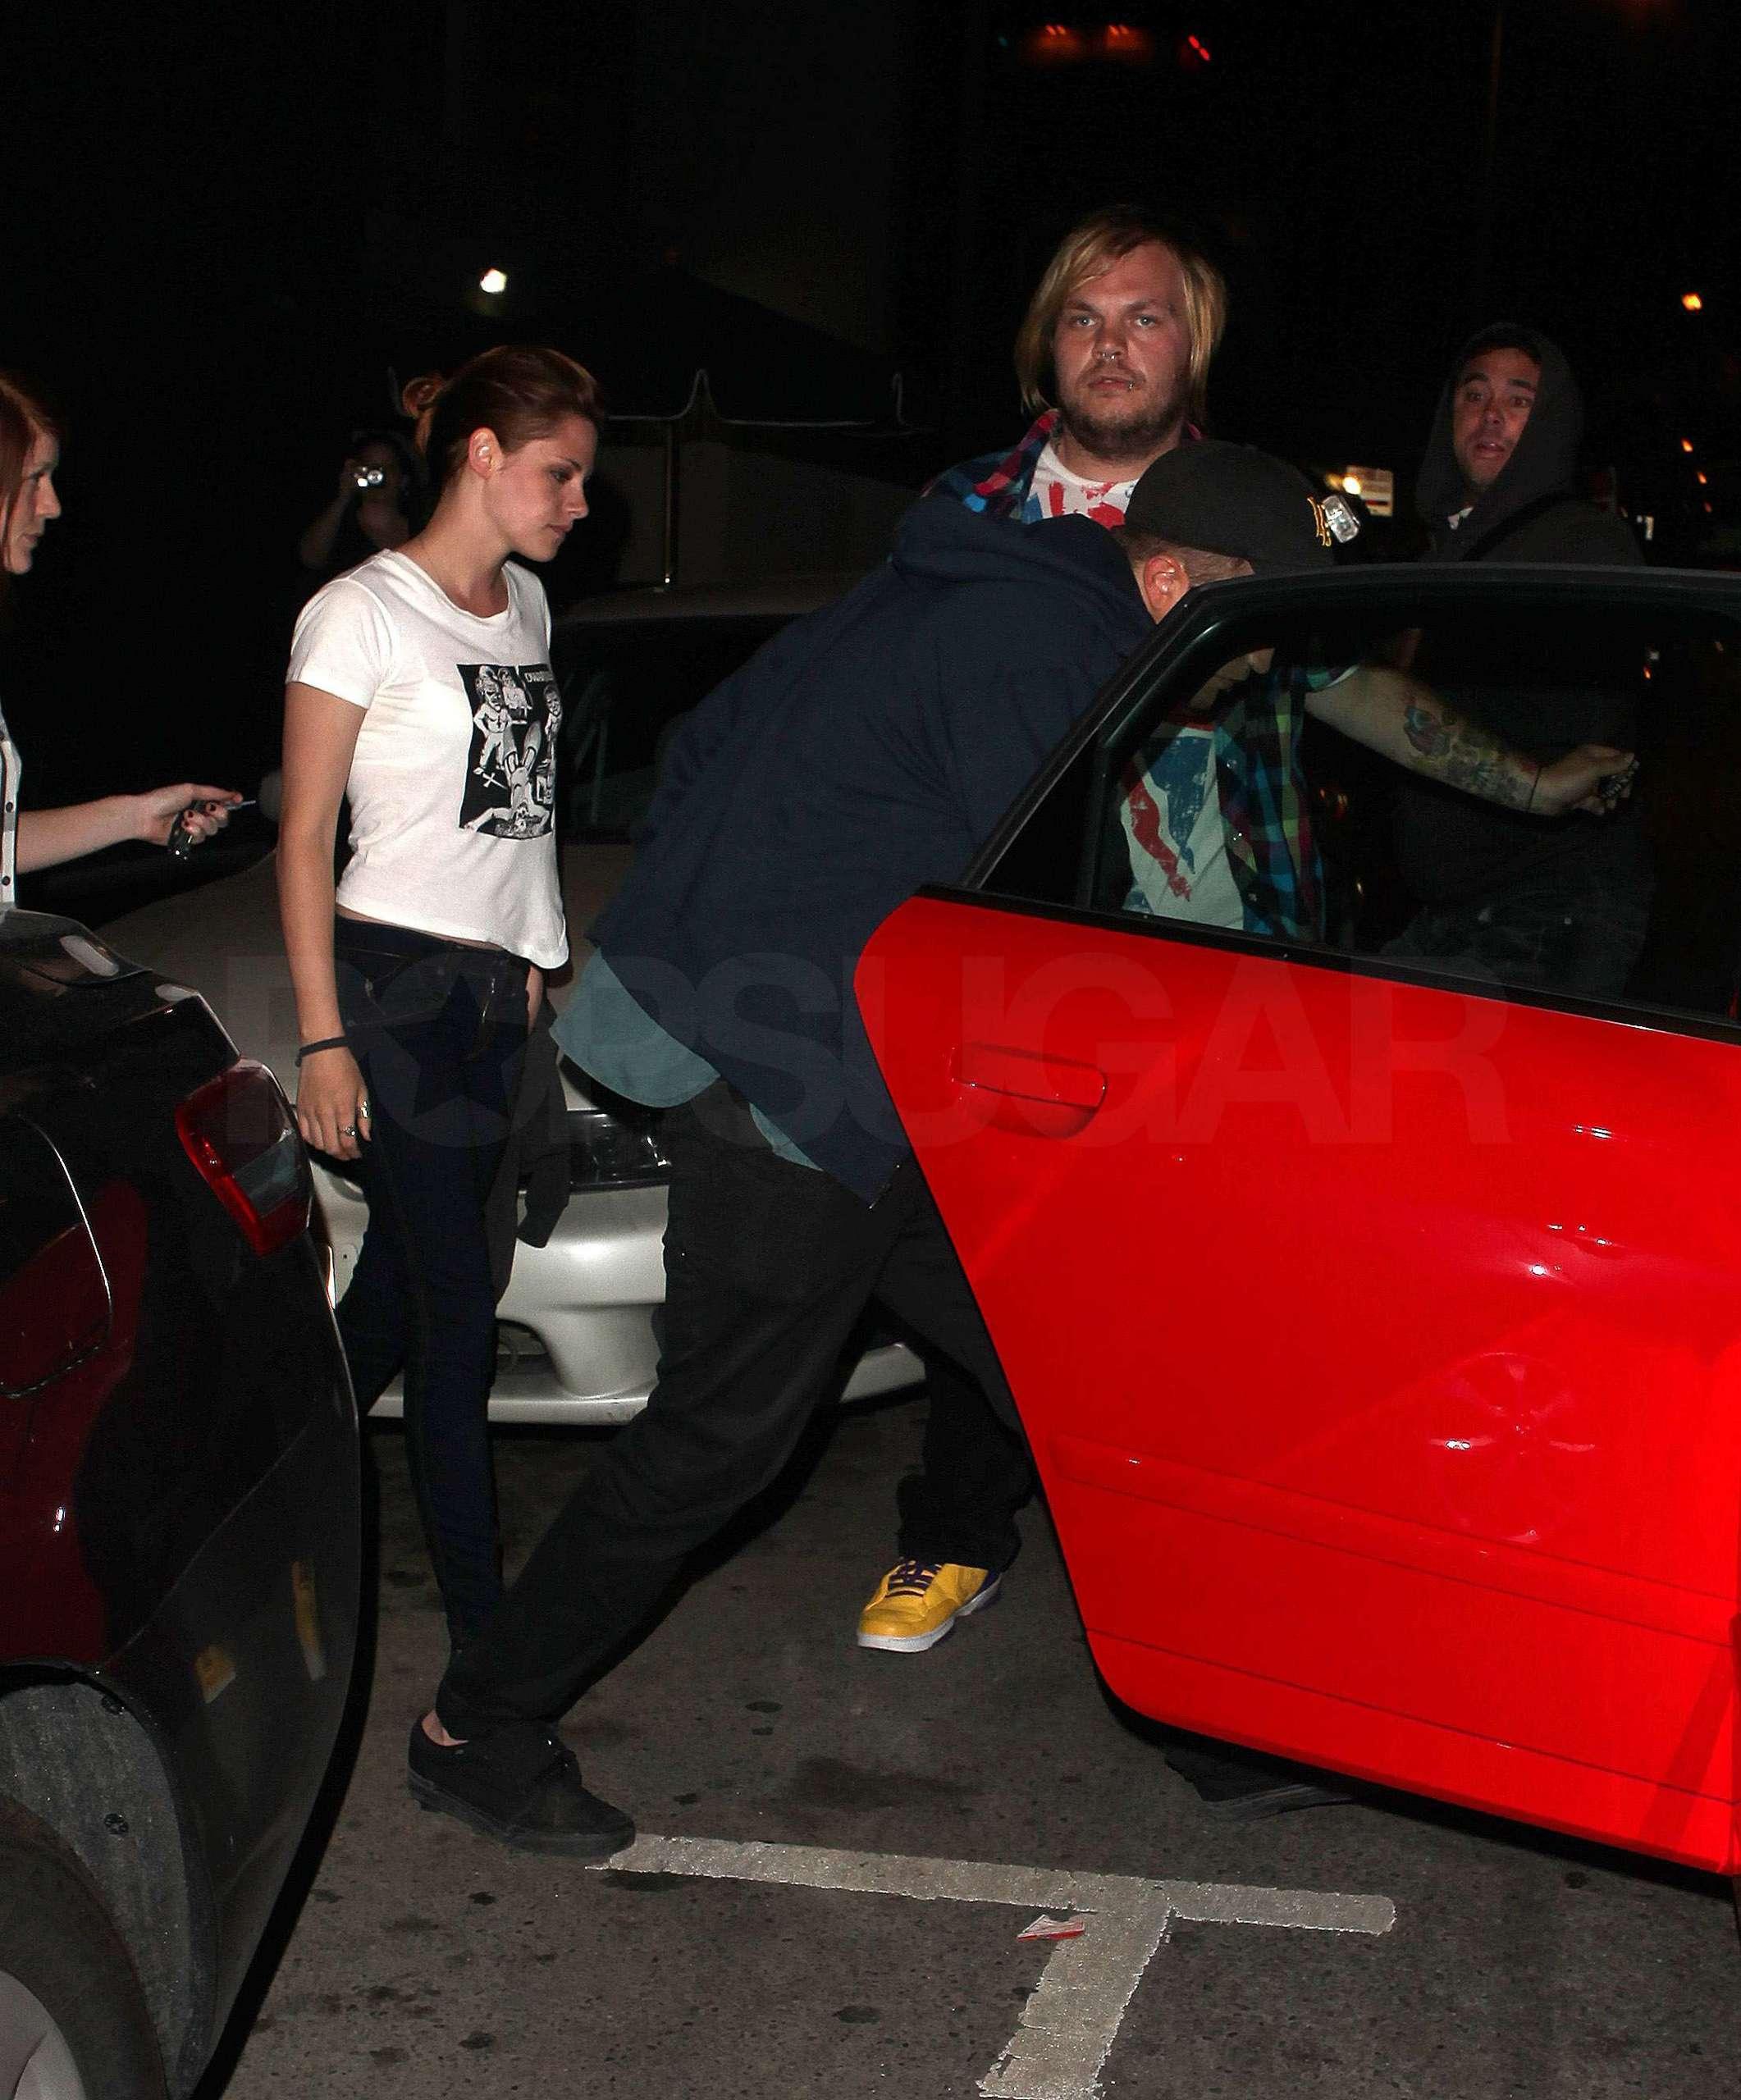 Rob and Kristen leaving Sam's concerto last night